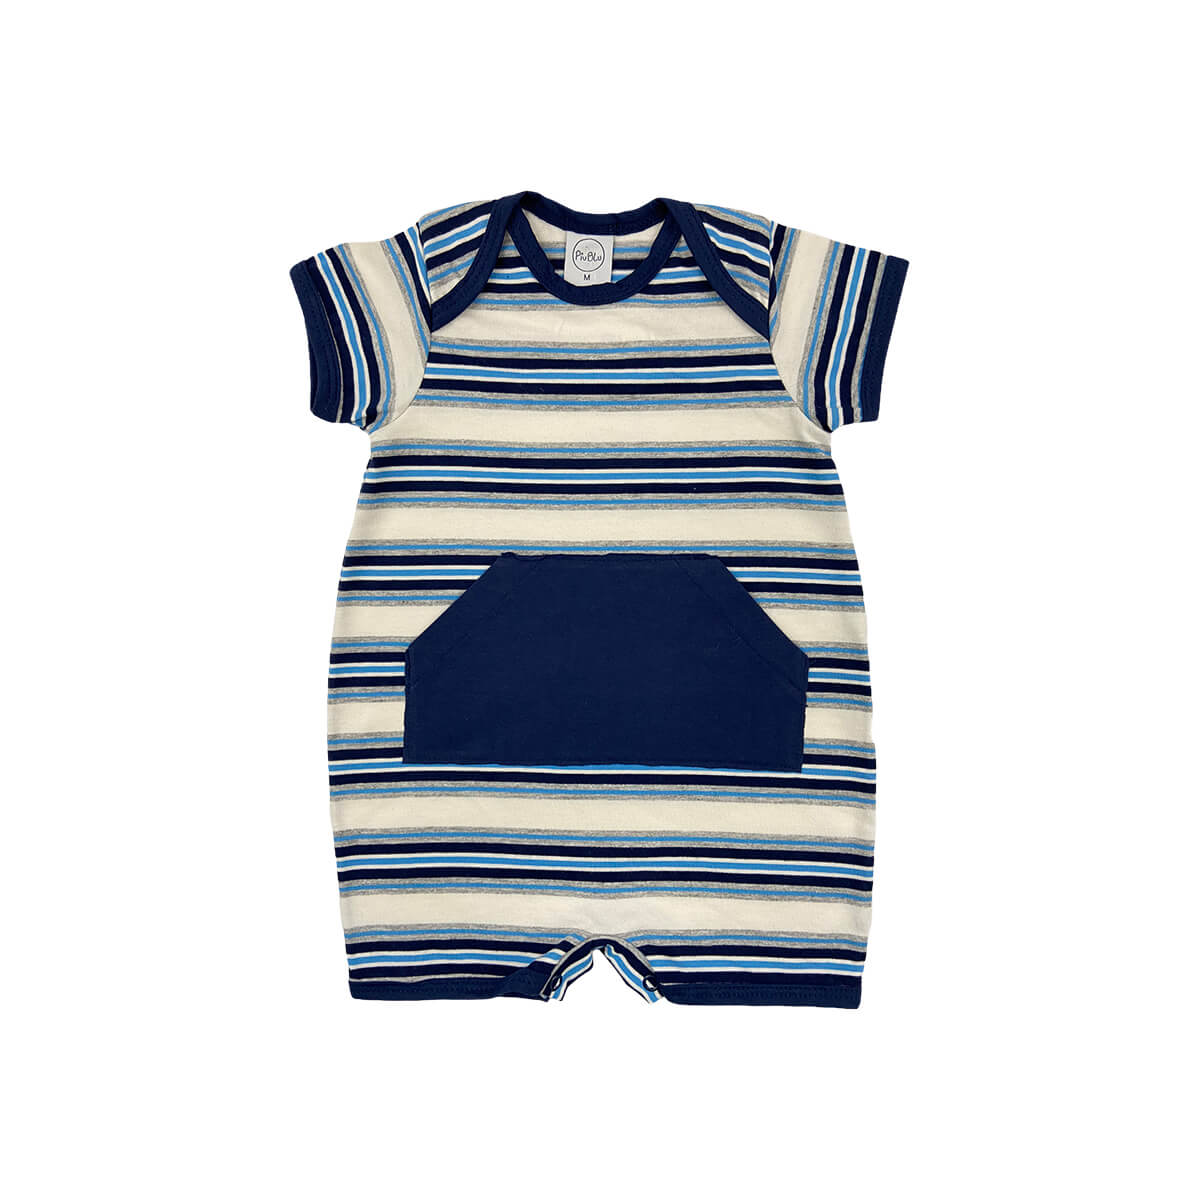 Sleeper Curto Listrado Azul c/ Bolso